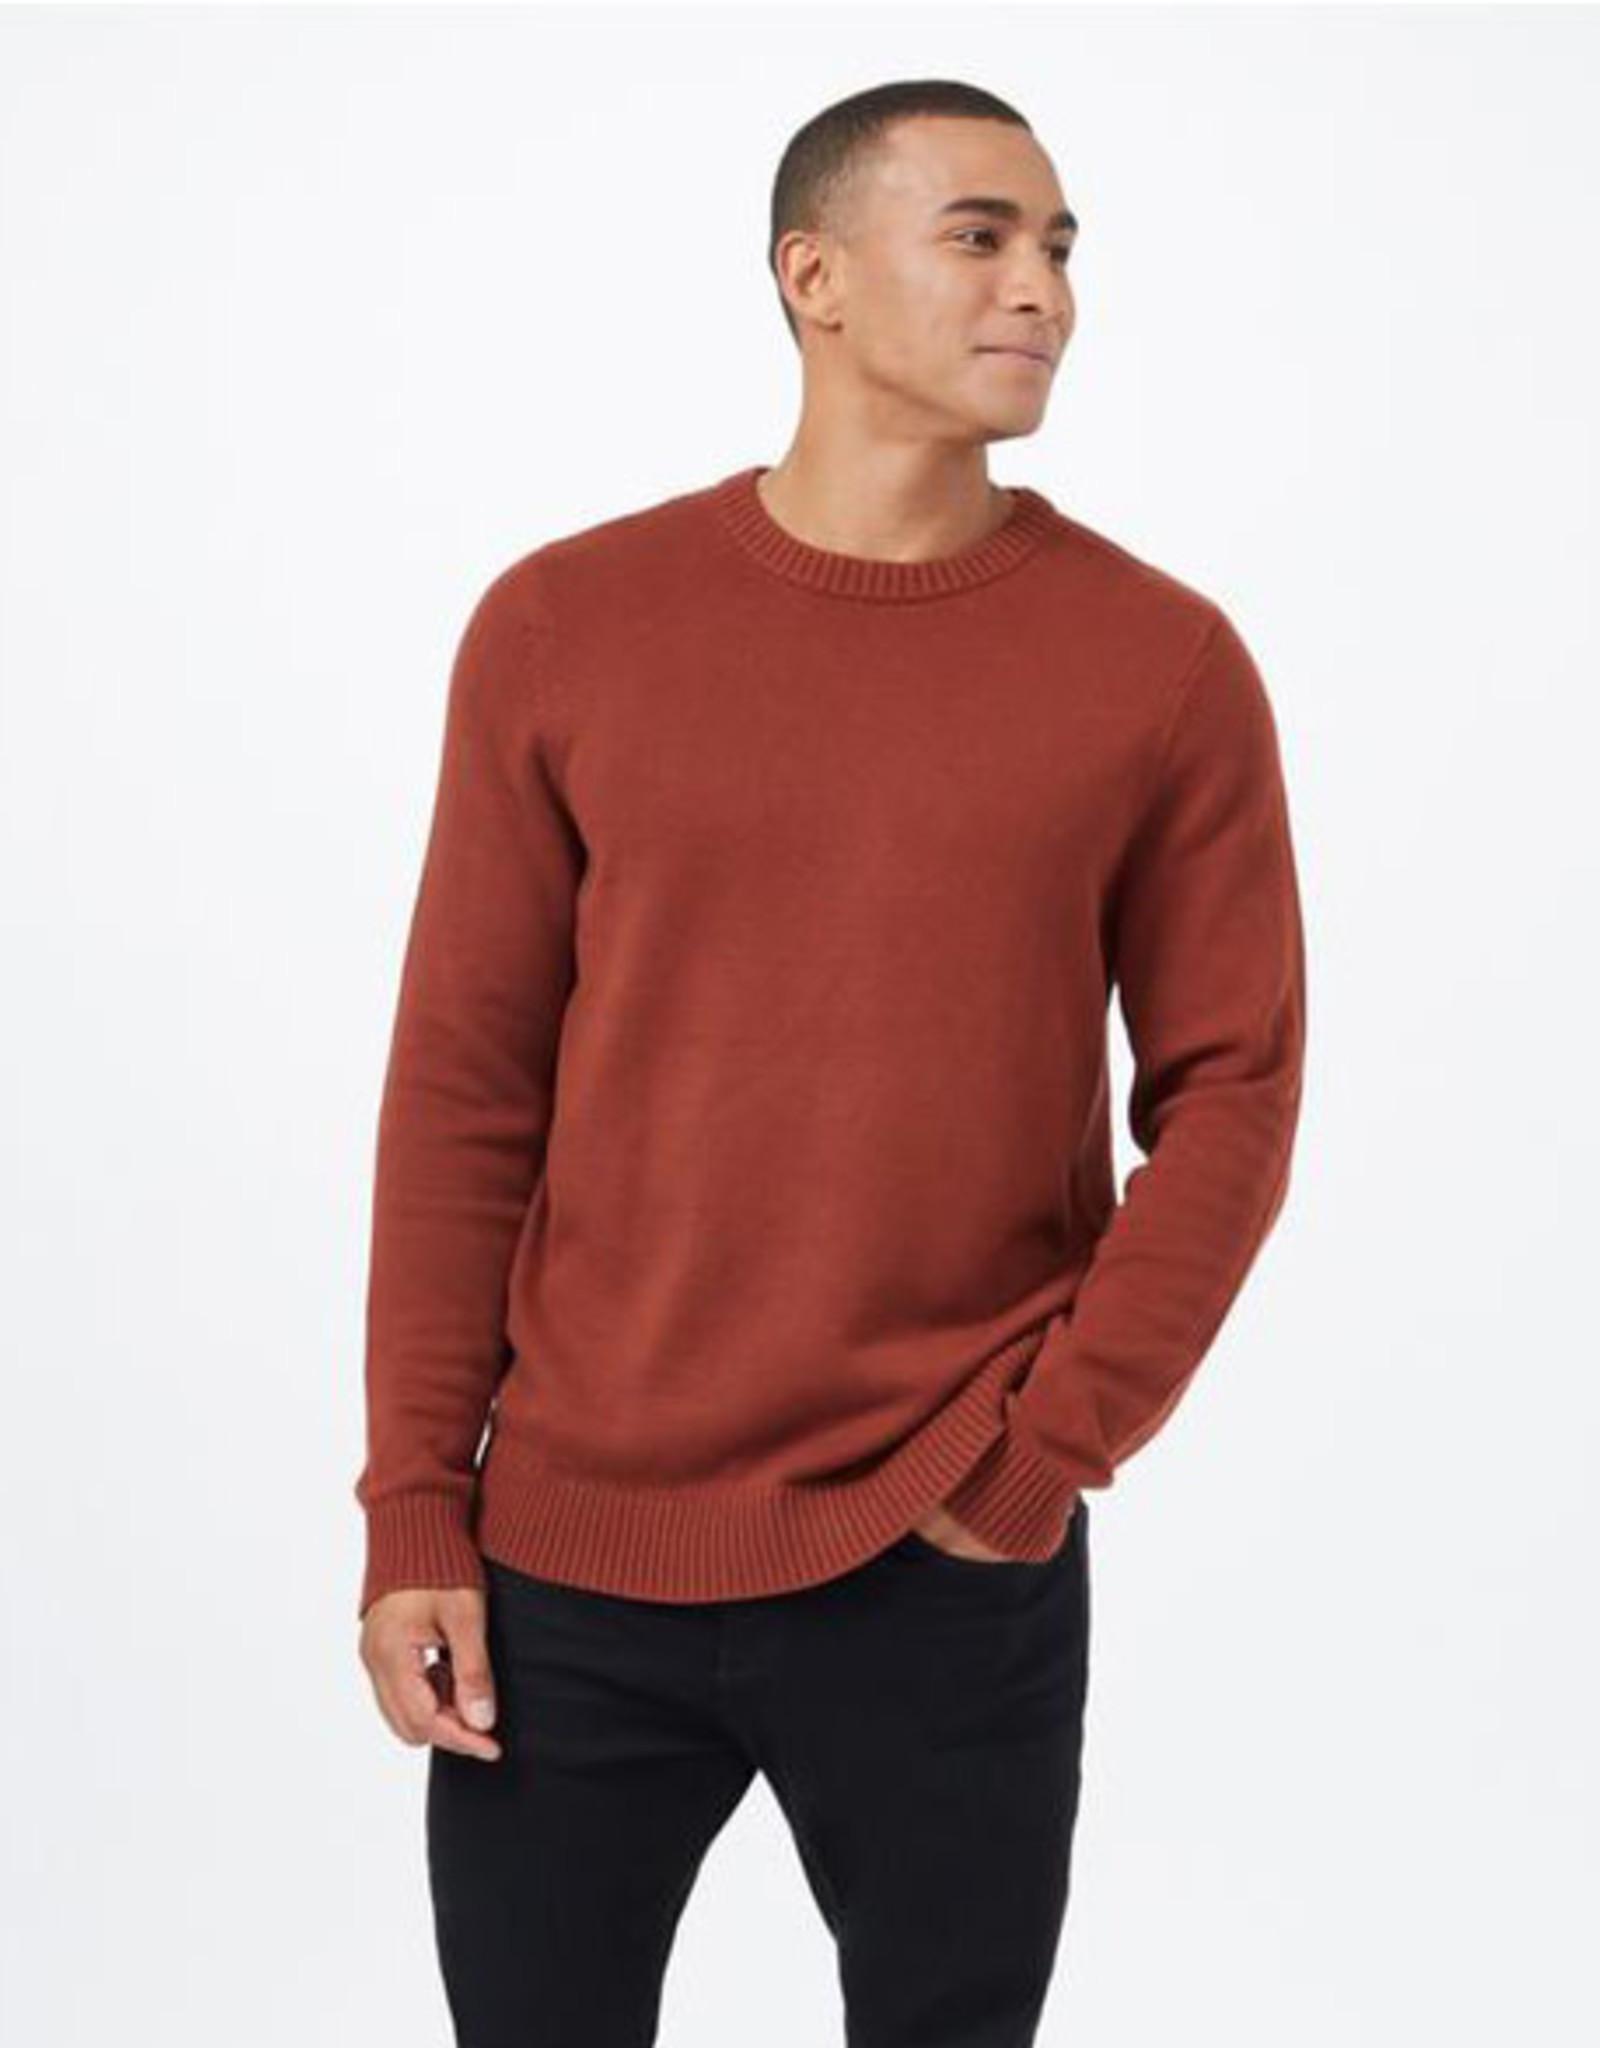 tentree Highline Crew Sweater - Cherry